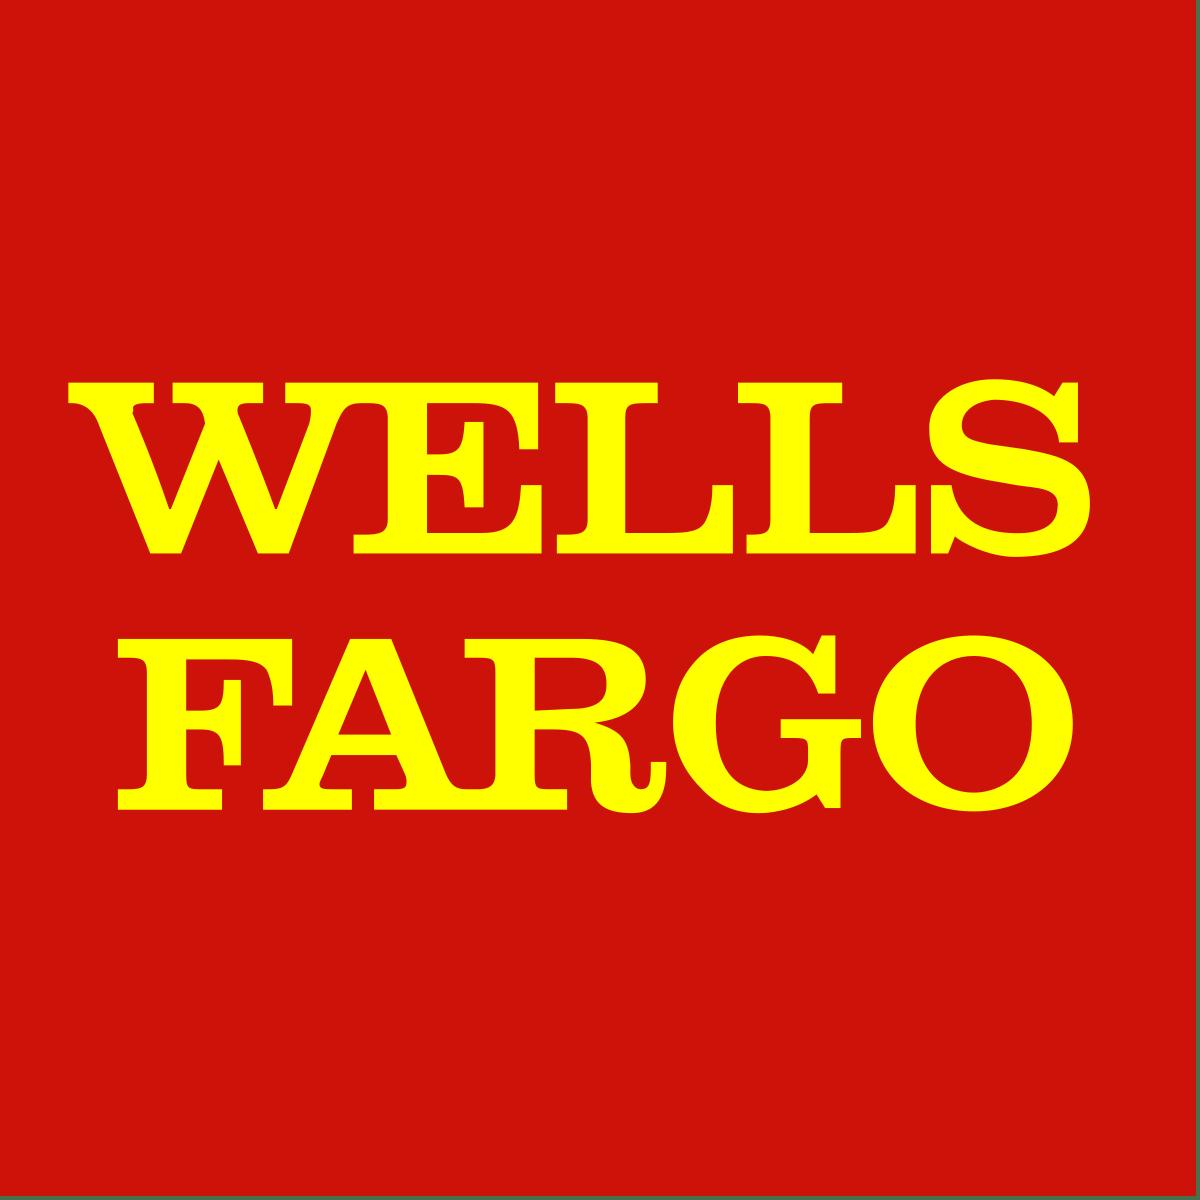 wells-fargo logo